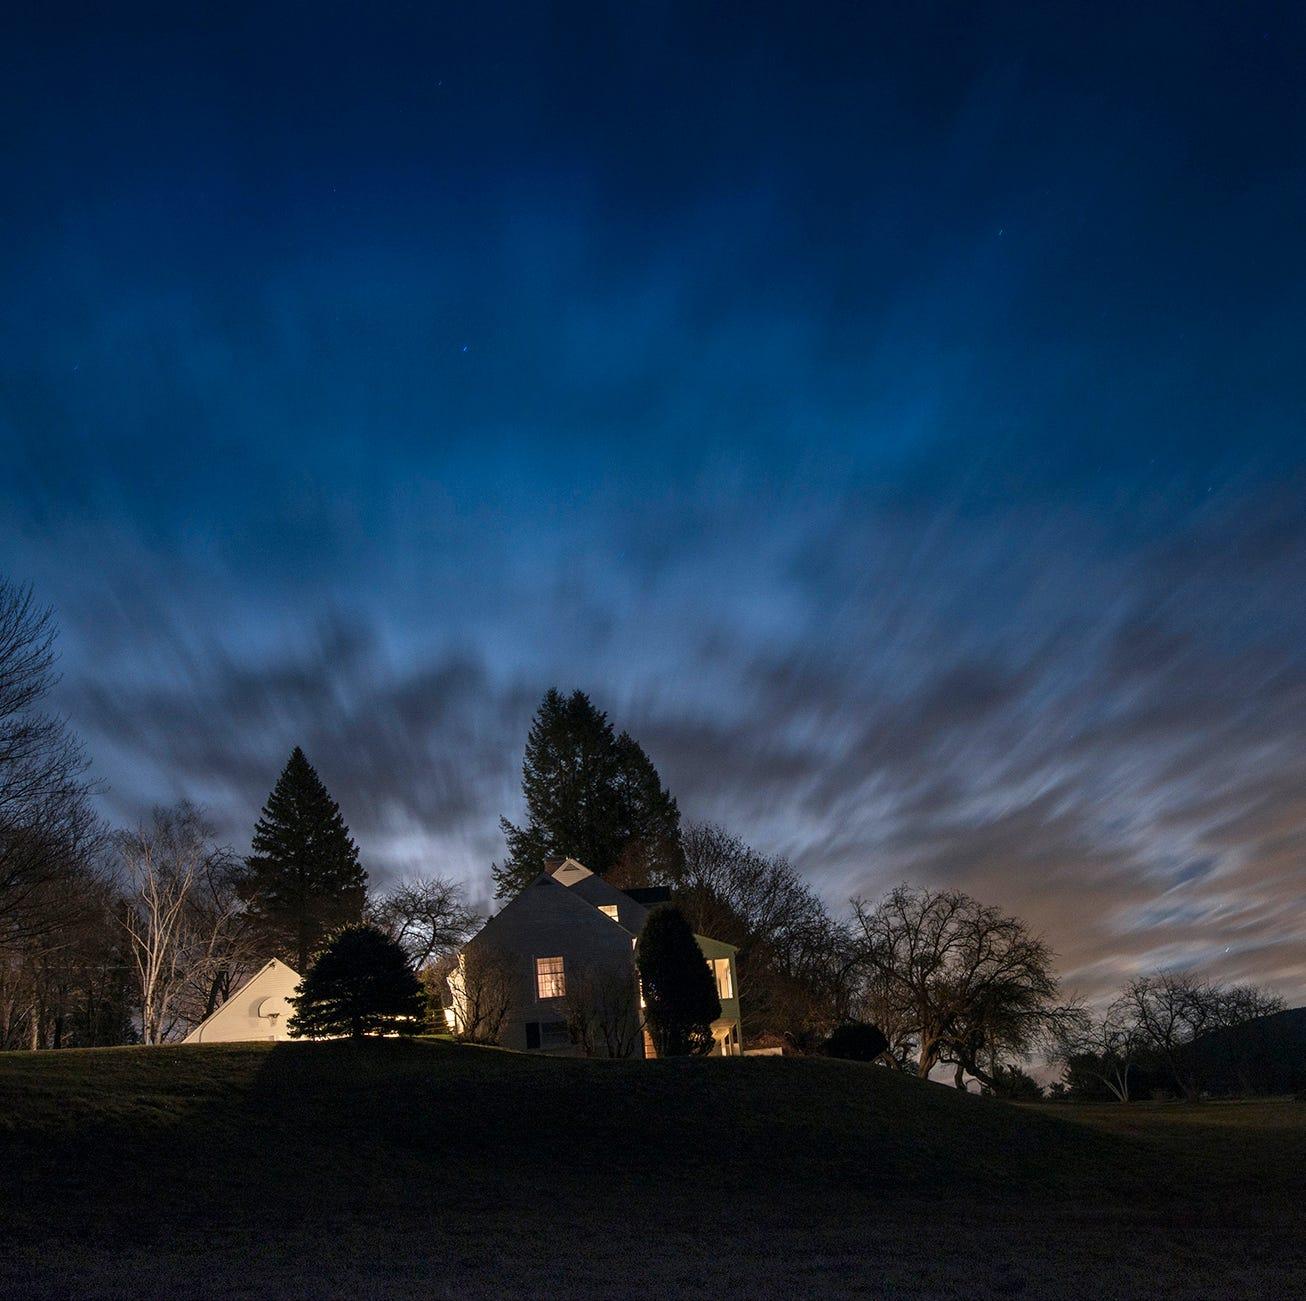 New winter exhibitions unveiled at Hunterdon Art Museum